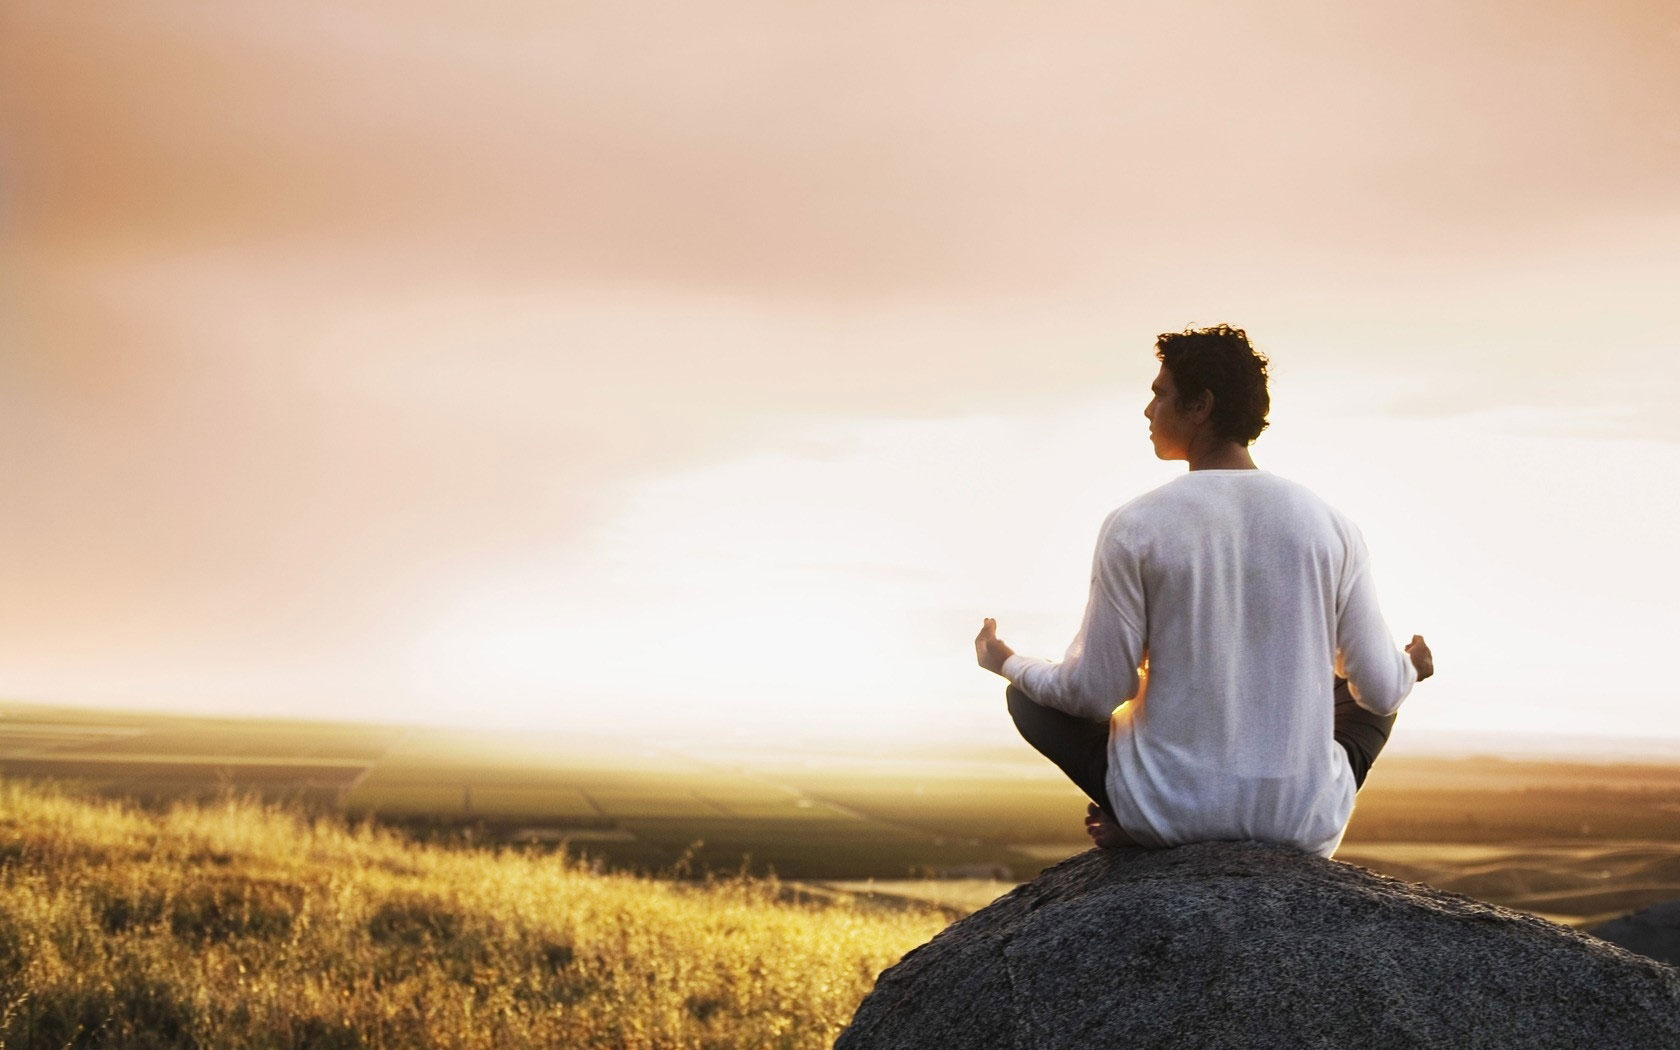 Meditation Hd Wallpaper Free Download